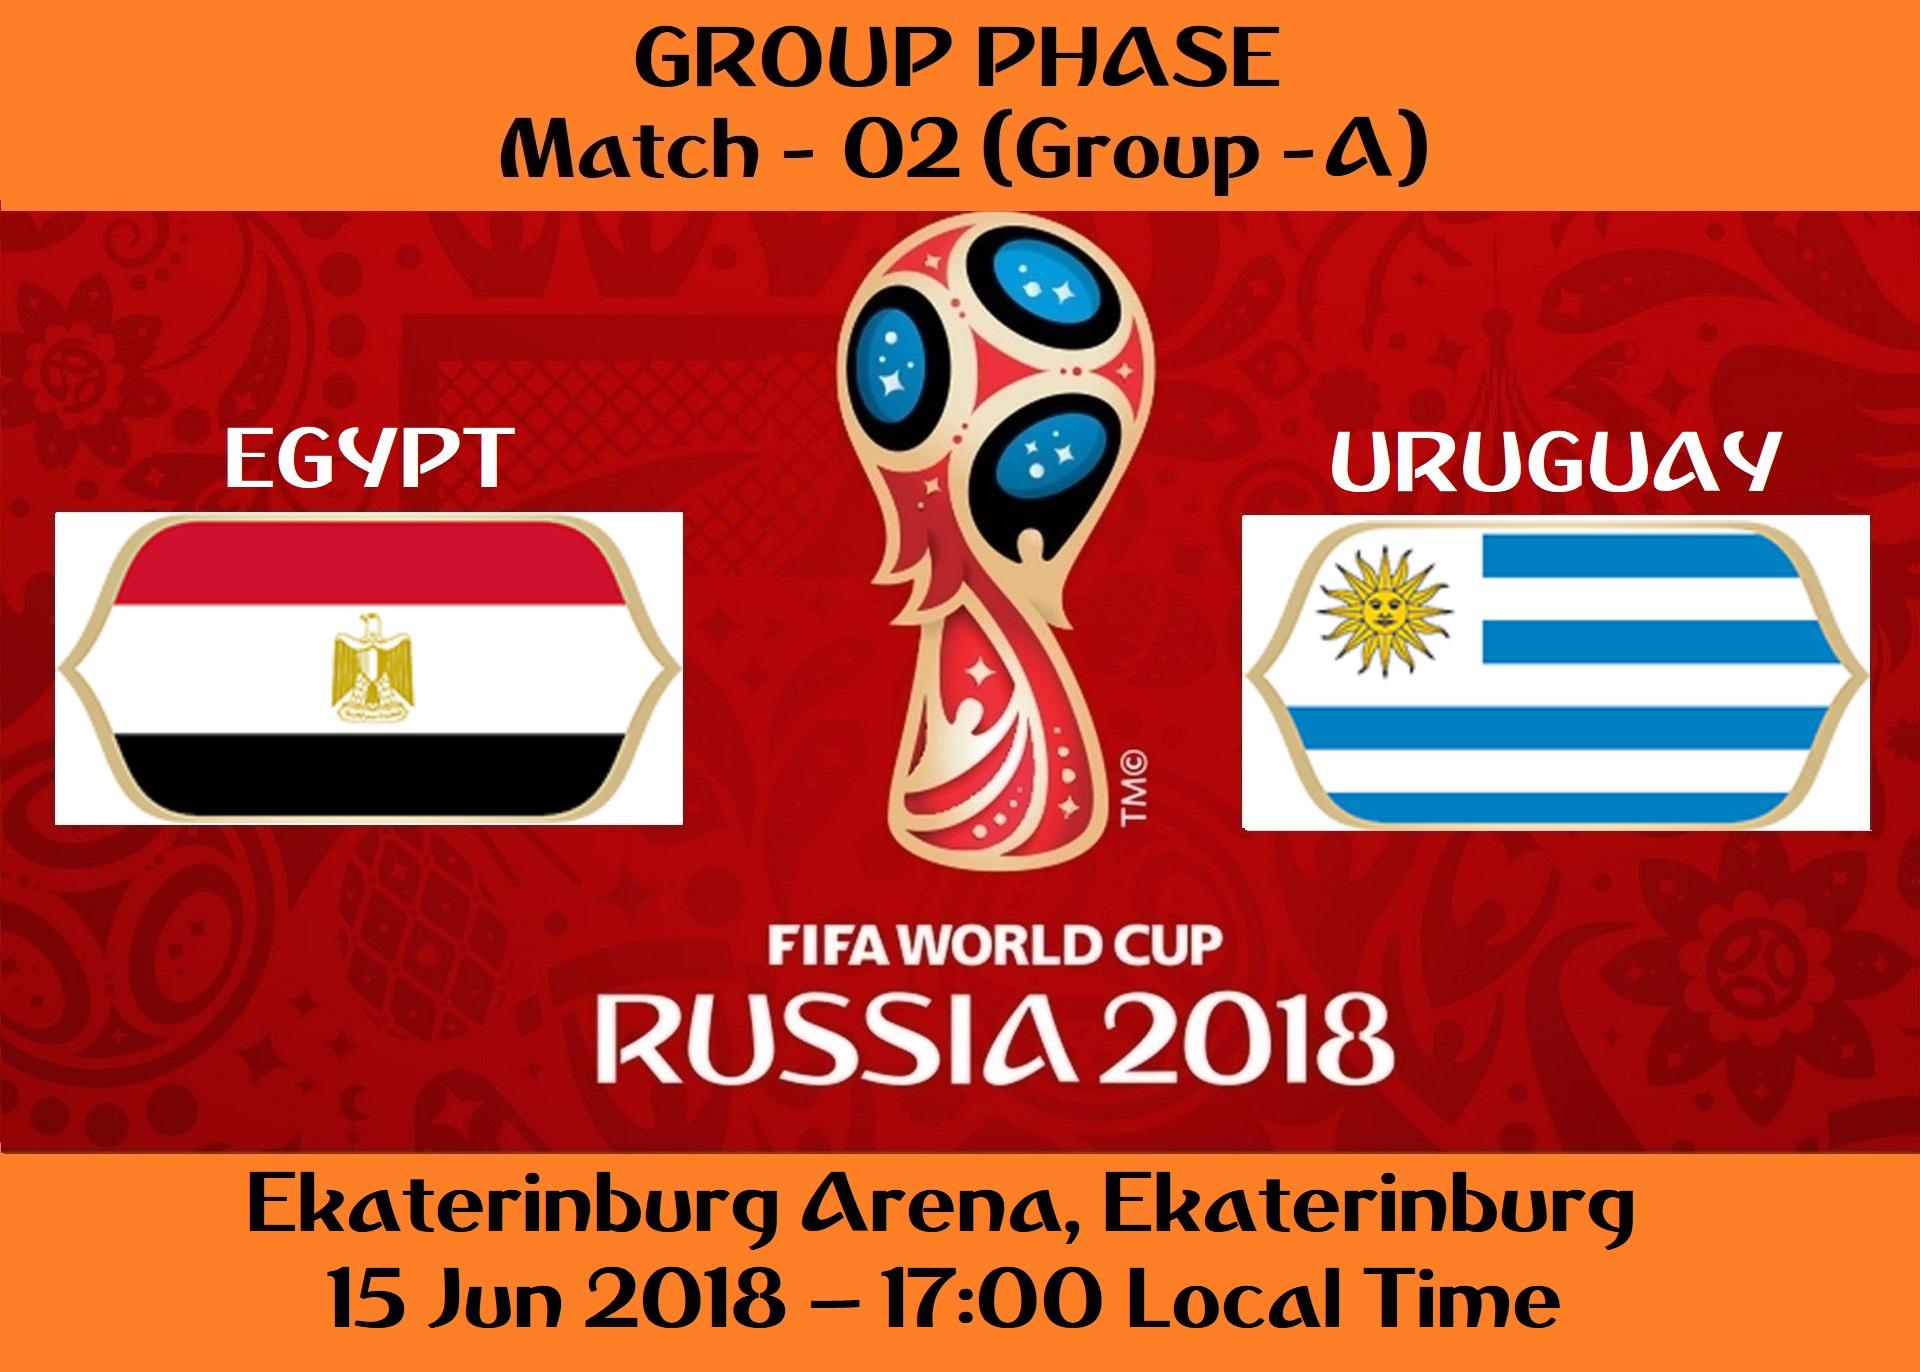 FIFA WORLD CUP 2018 MATCH - 2 - EGYPT vs URUGUAY